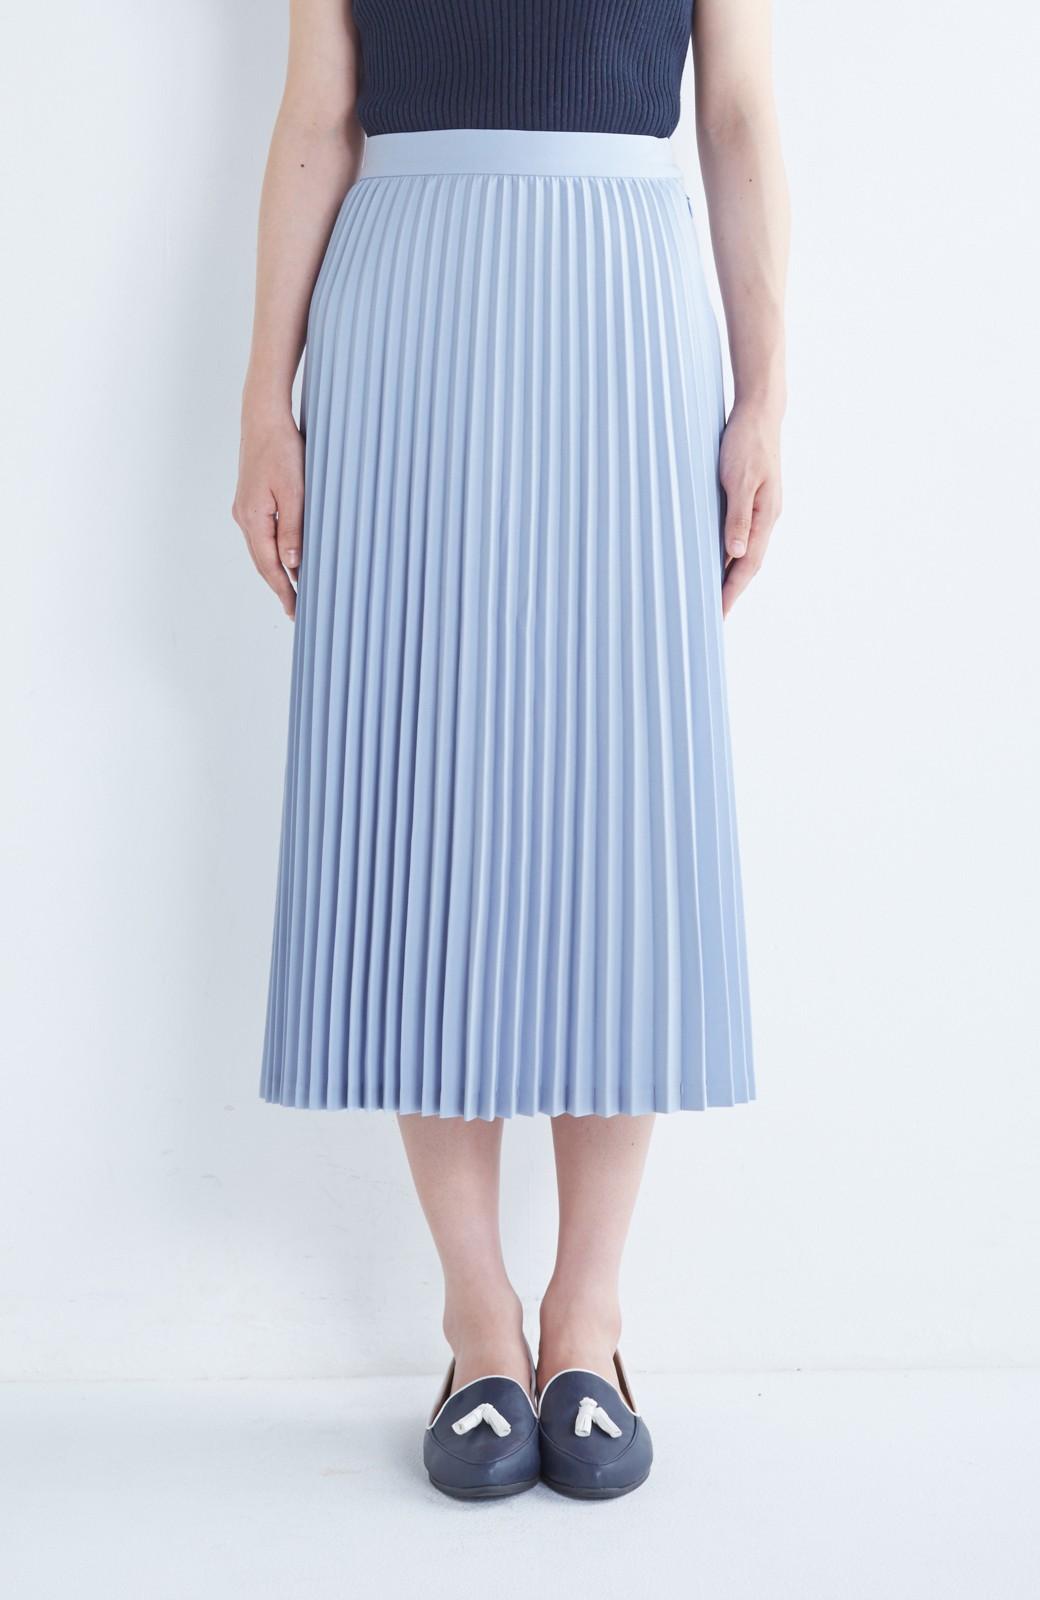 haco! 【mer11月号掲載】折り目正しい大人のためのプリーツスカート by que made me <サックスブルー>の商品写真2